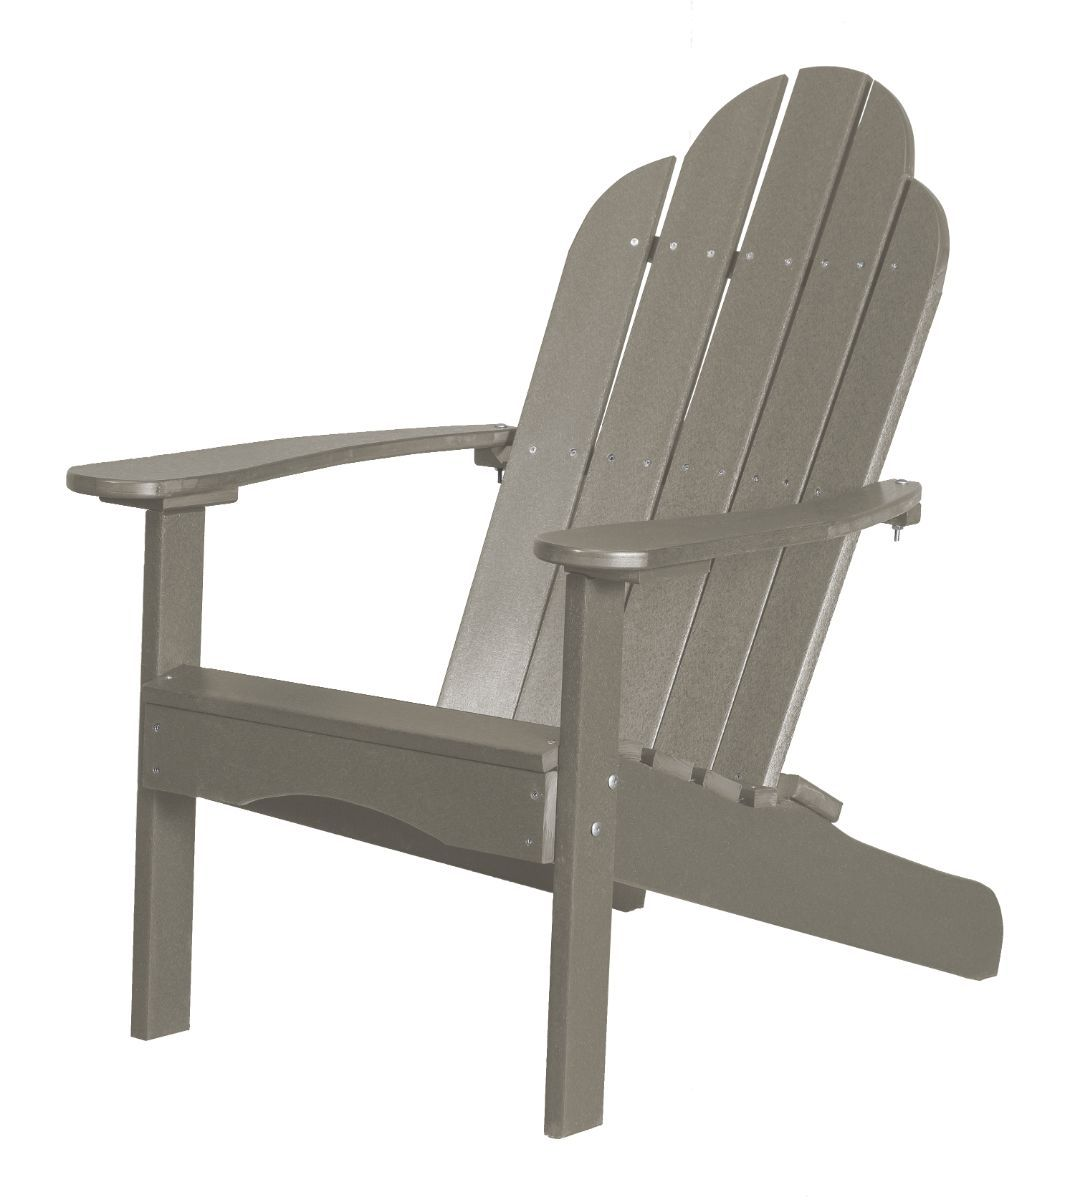 Light Gray Odessa Adirondack Chair